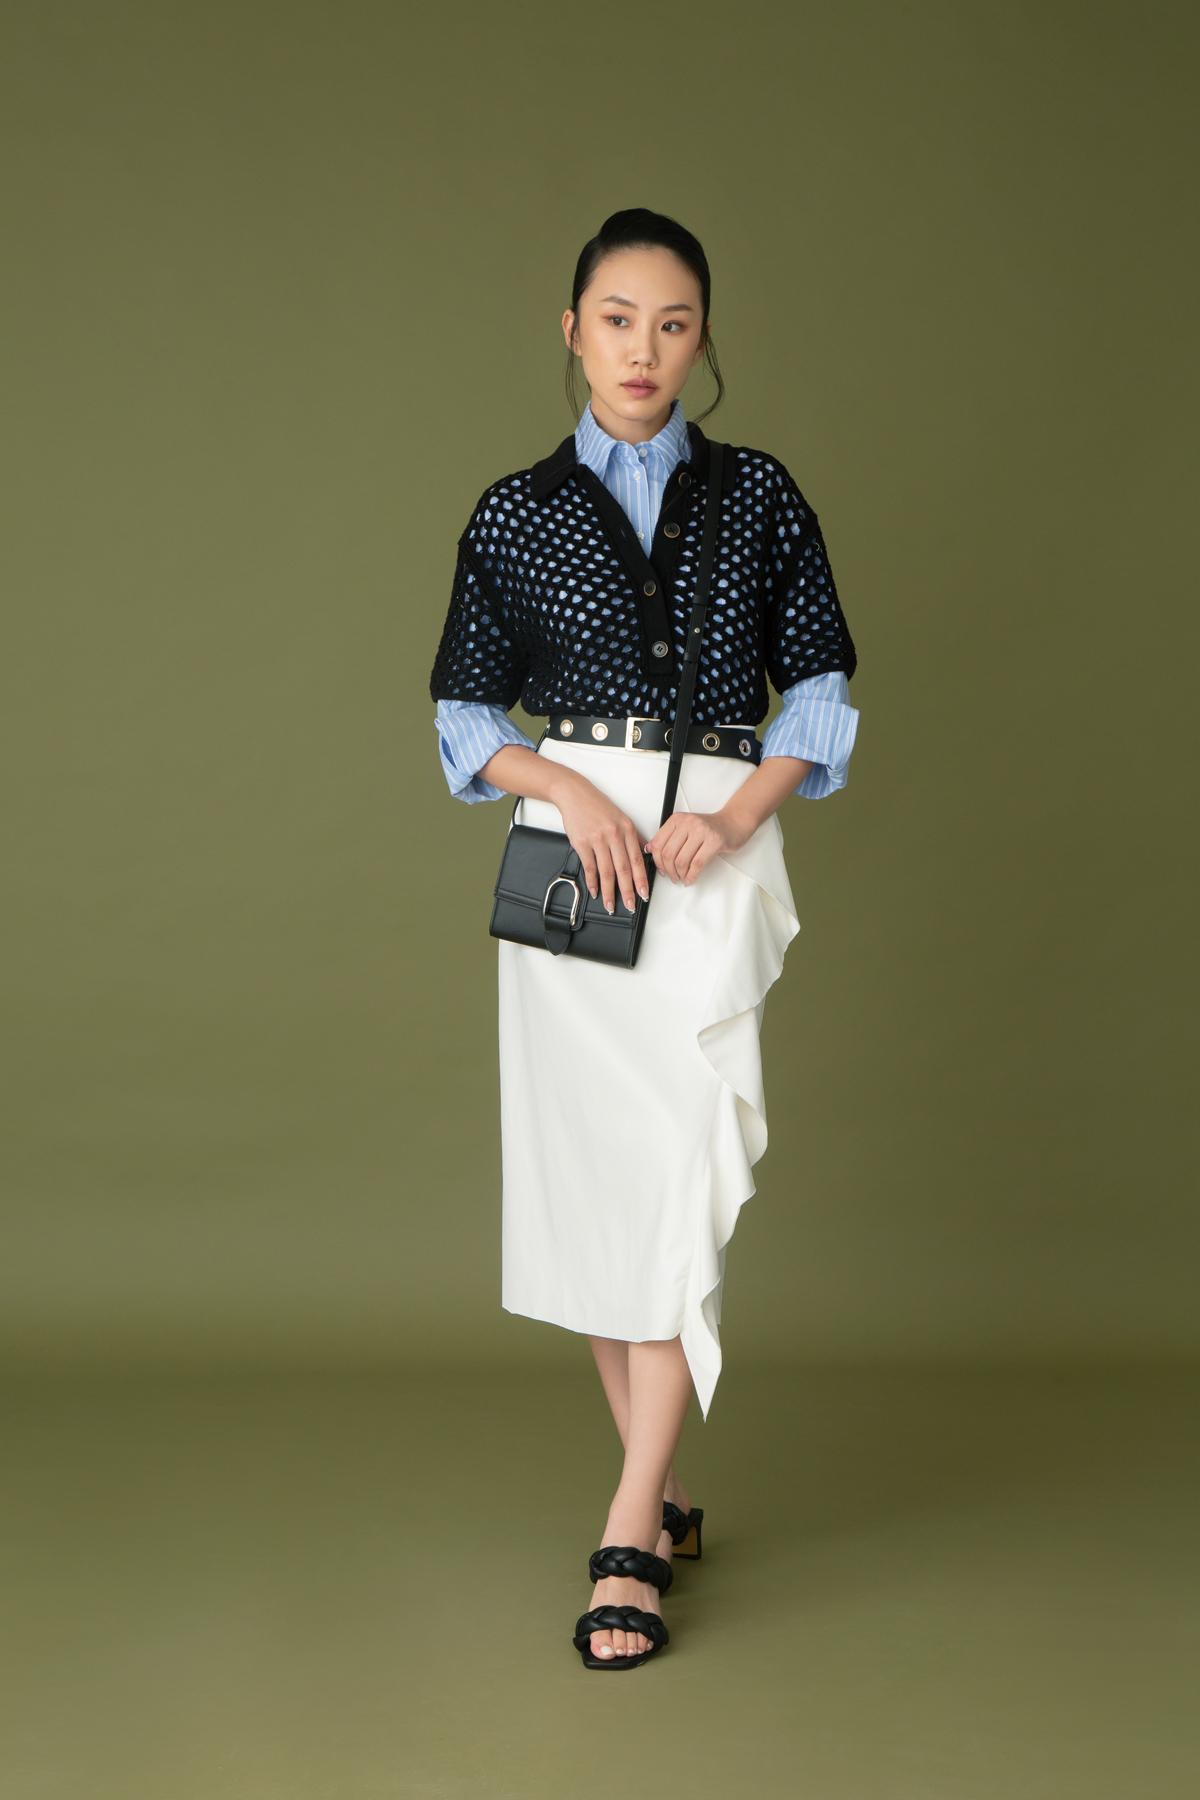 H&M blue striped shirt $329 and black netted top $329 Marina Rinaldi white ruffles skirt $6,280 Penny Black leather belt $980 Ralph Lauren leather handbag $9,900 H&M black sandals $279